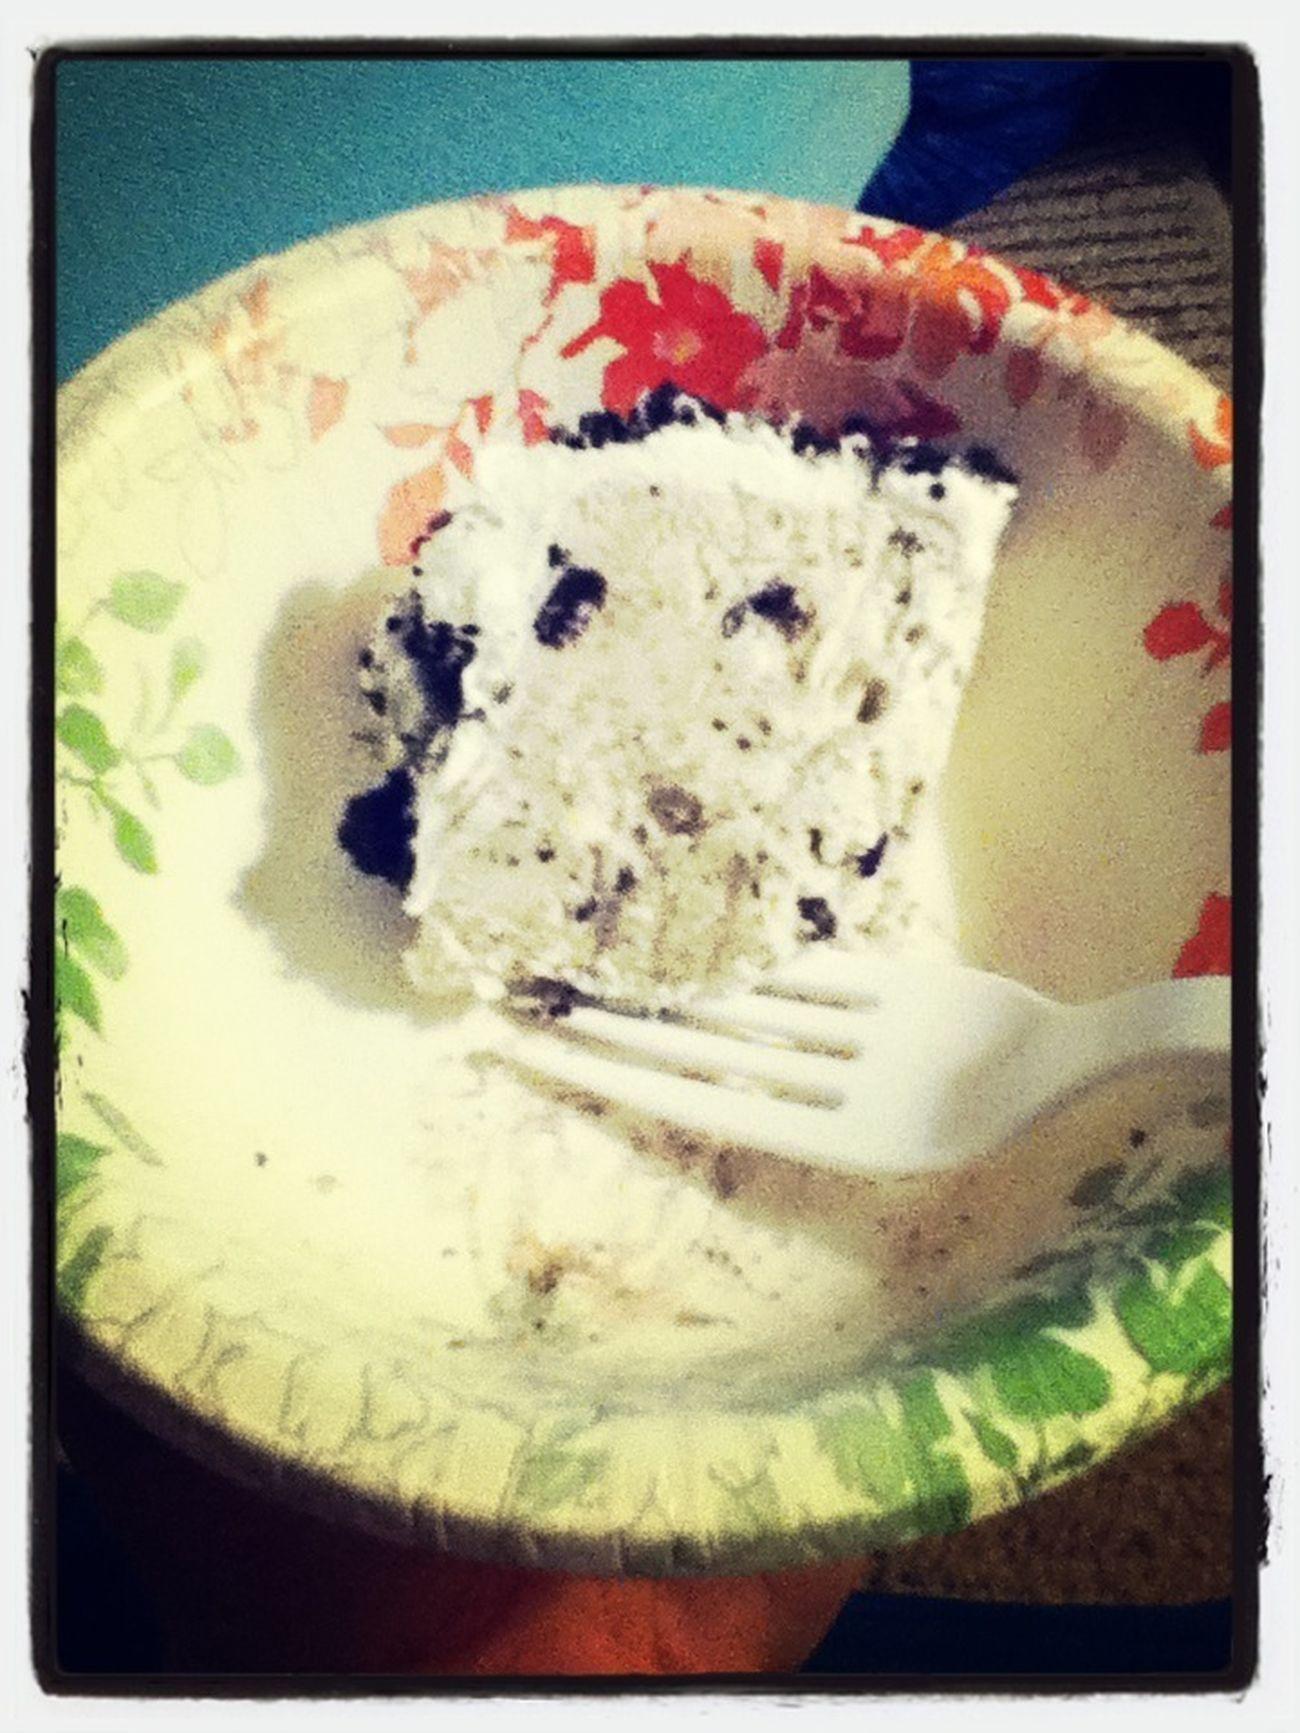 Oreo Icecream Cake :P